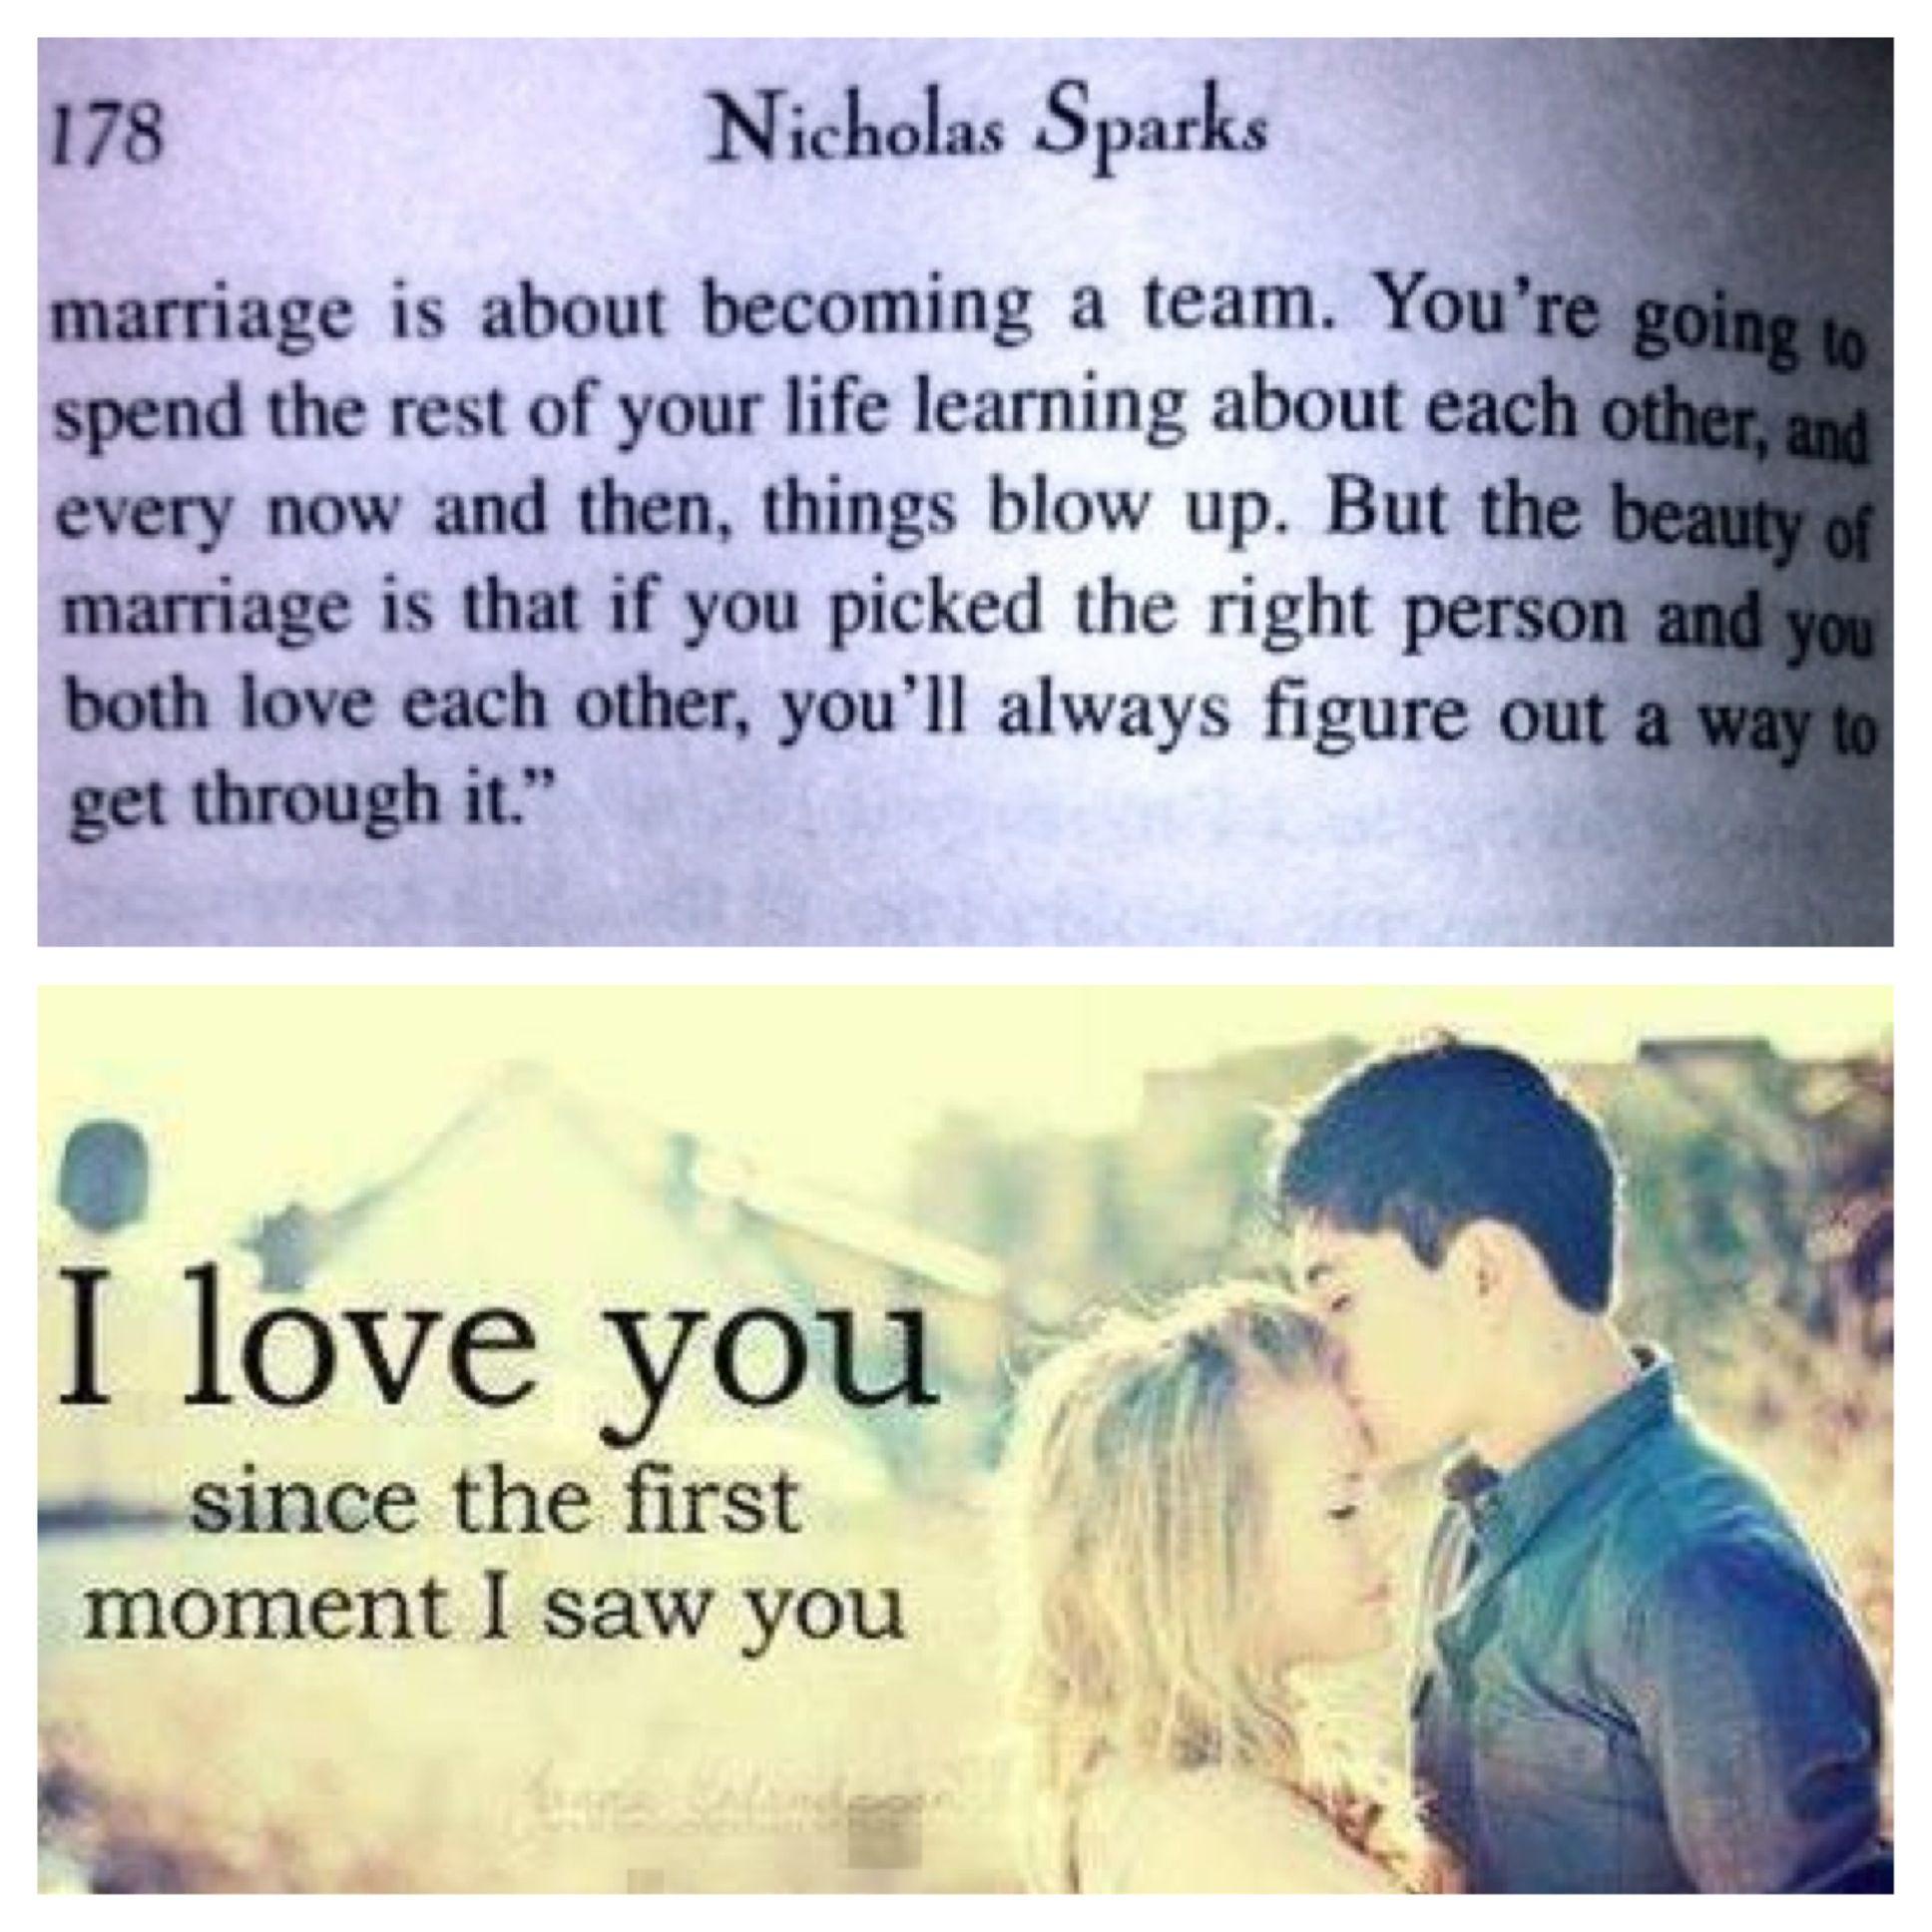 Quotes Love Marriage Nicholas Sparkslovemarriage  Love  Pinterest  Nicholas